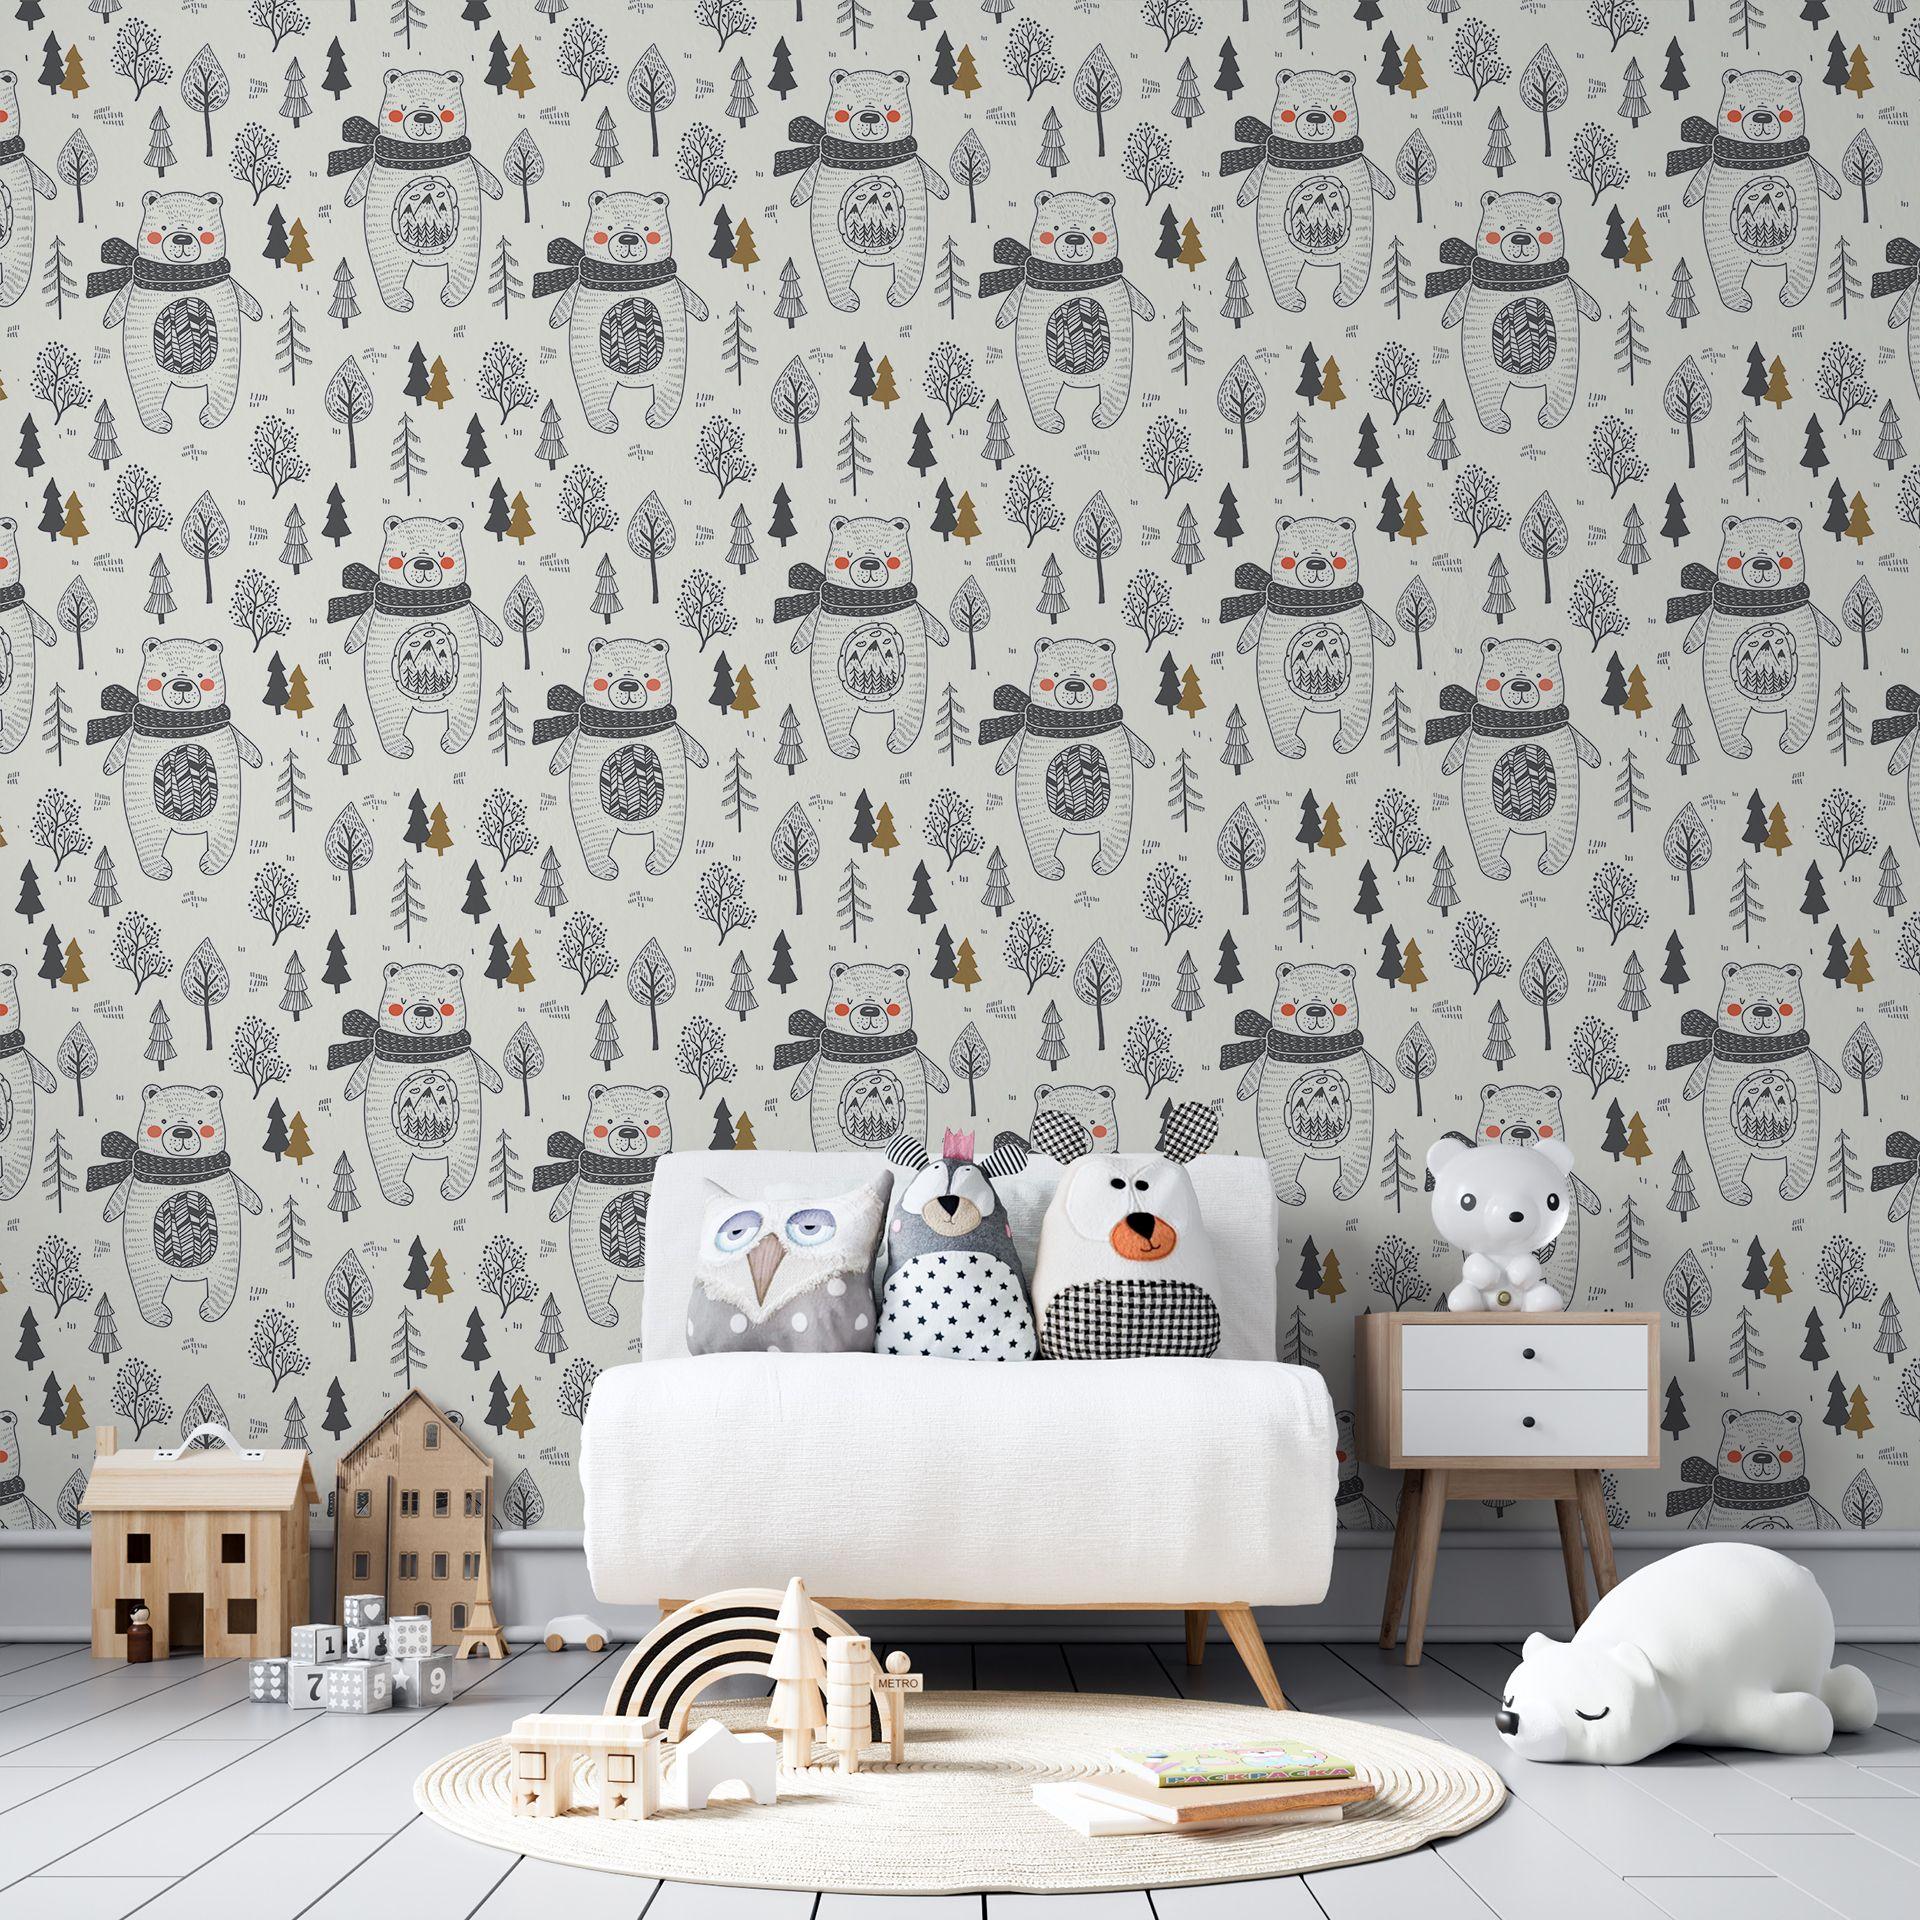 Self Adhesive Handmade Removable Wallpaper Wallpaper Decor Magical Decor Removable Wallpaper